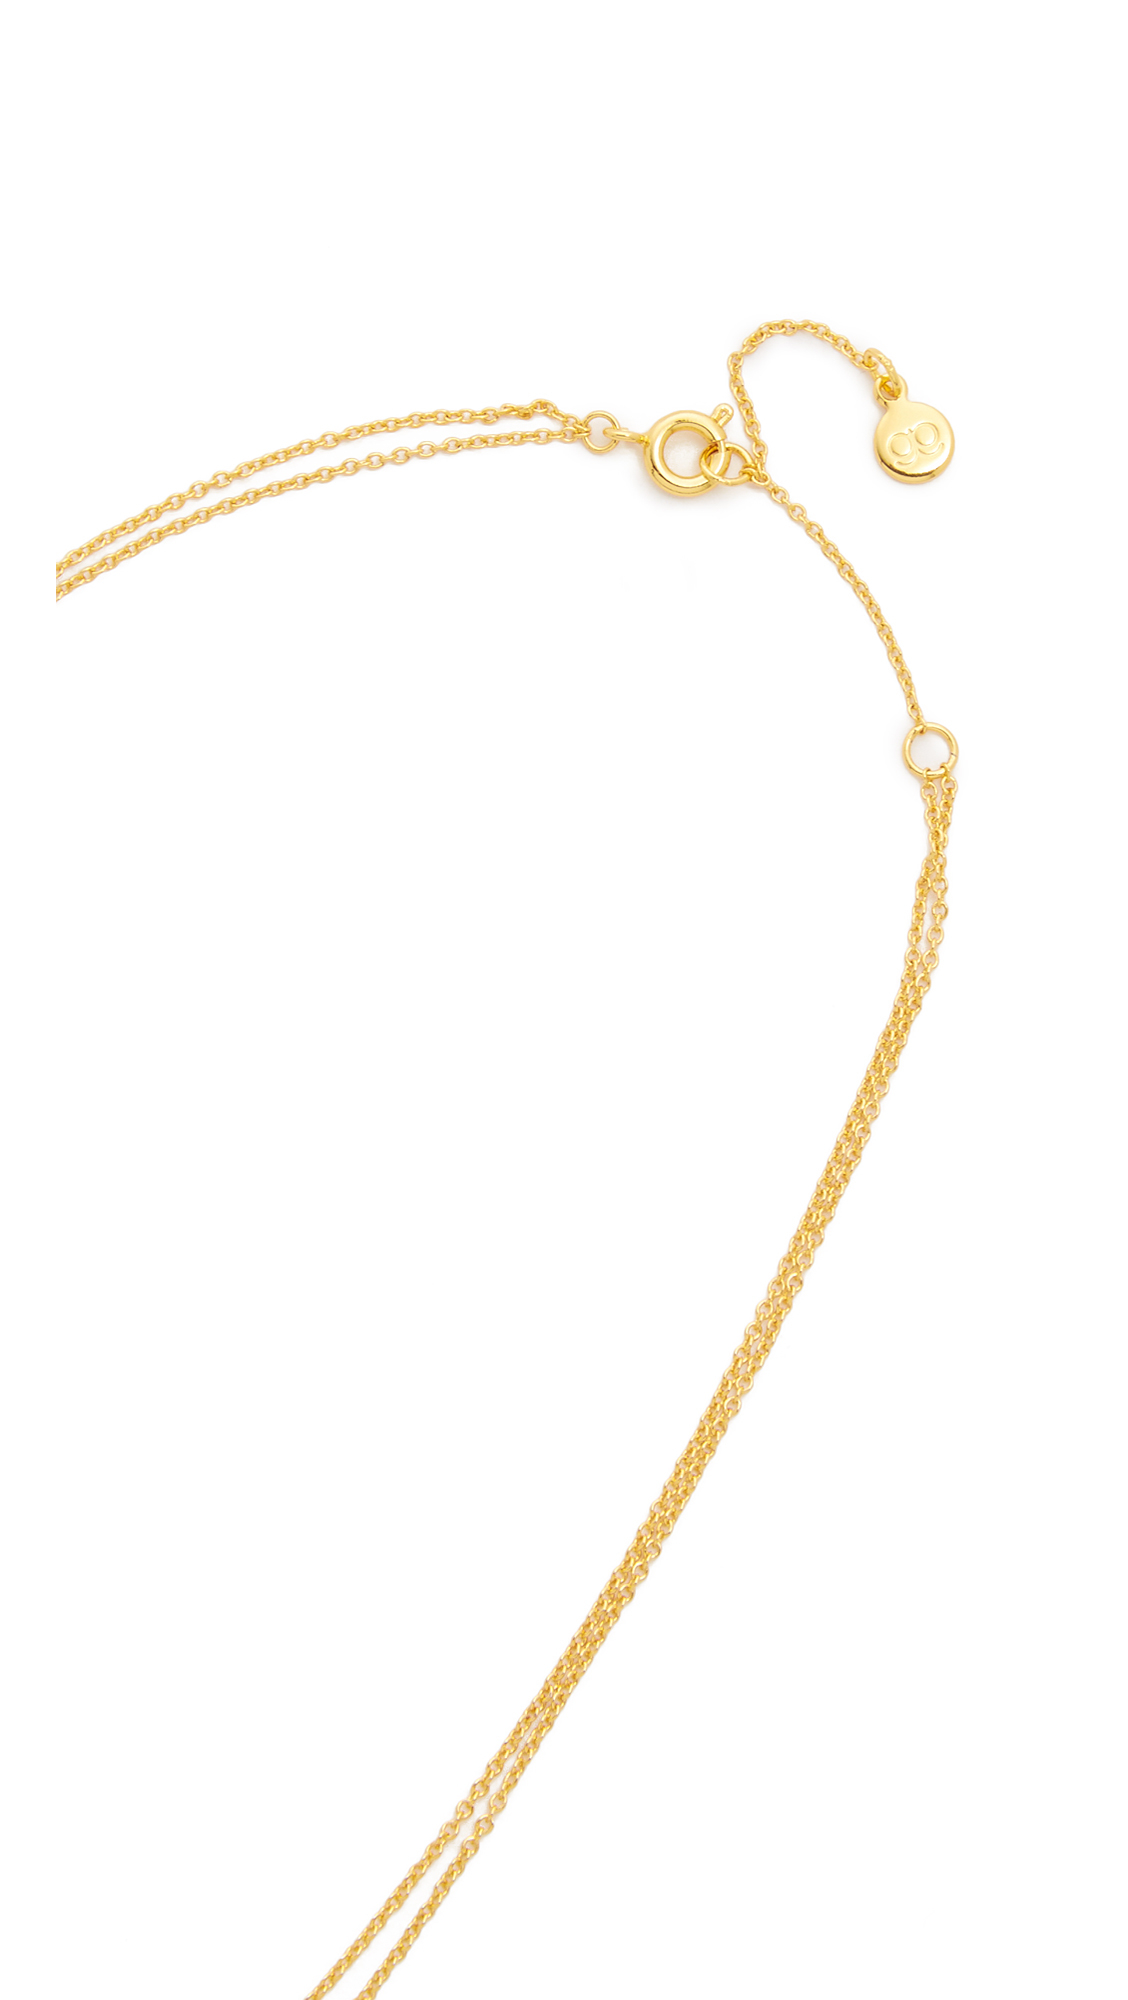 Gorjana Chloe Mini Layer Necklace in Gold (Metallic)